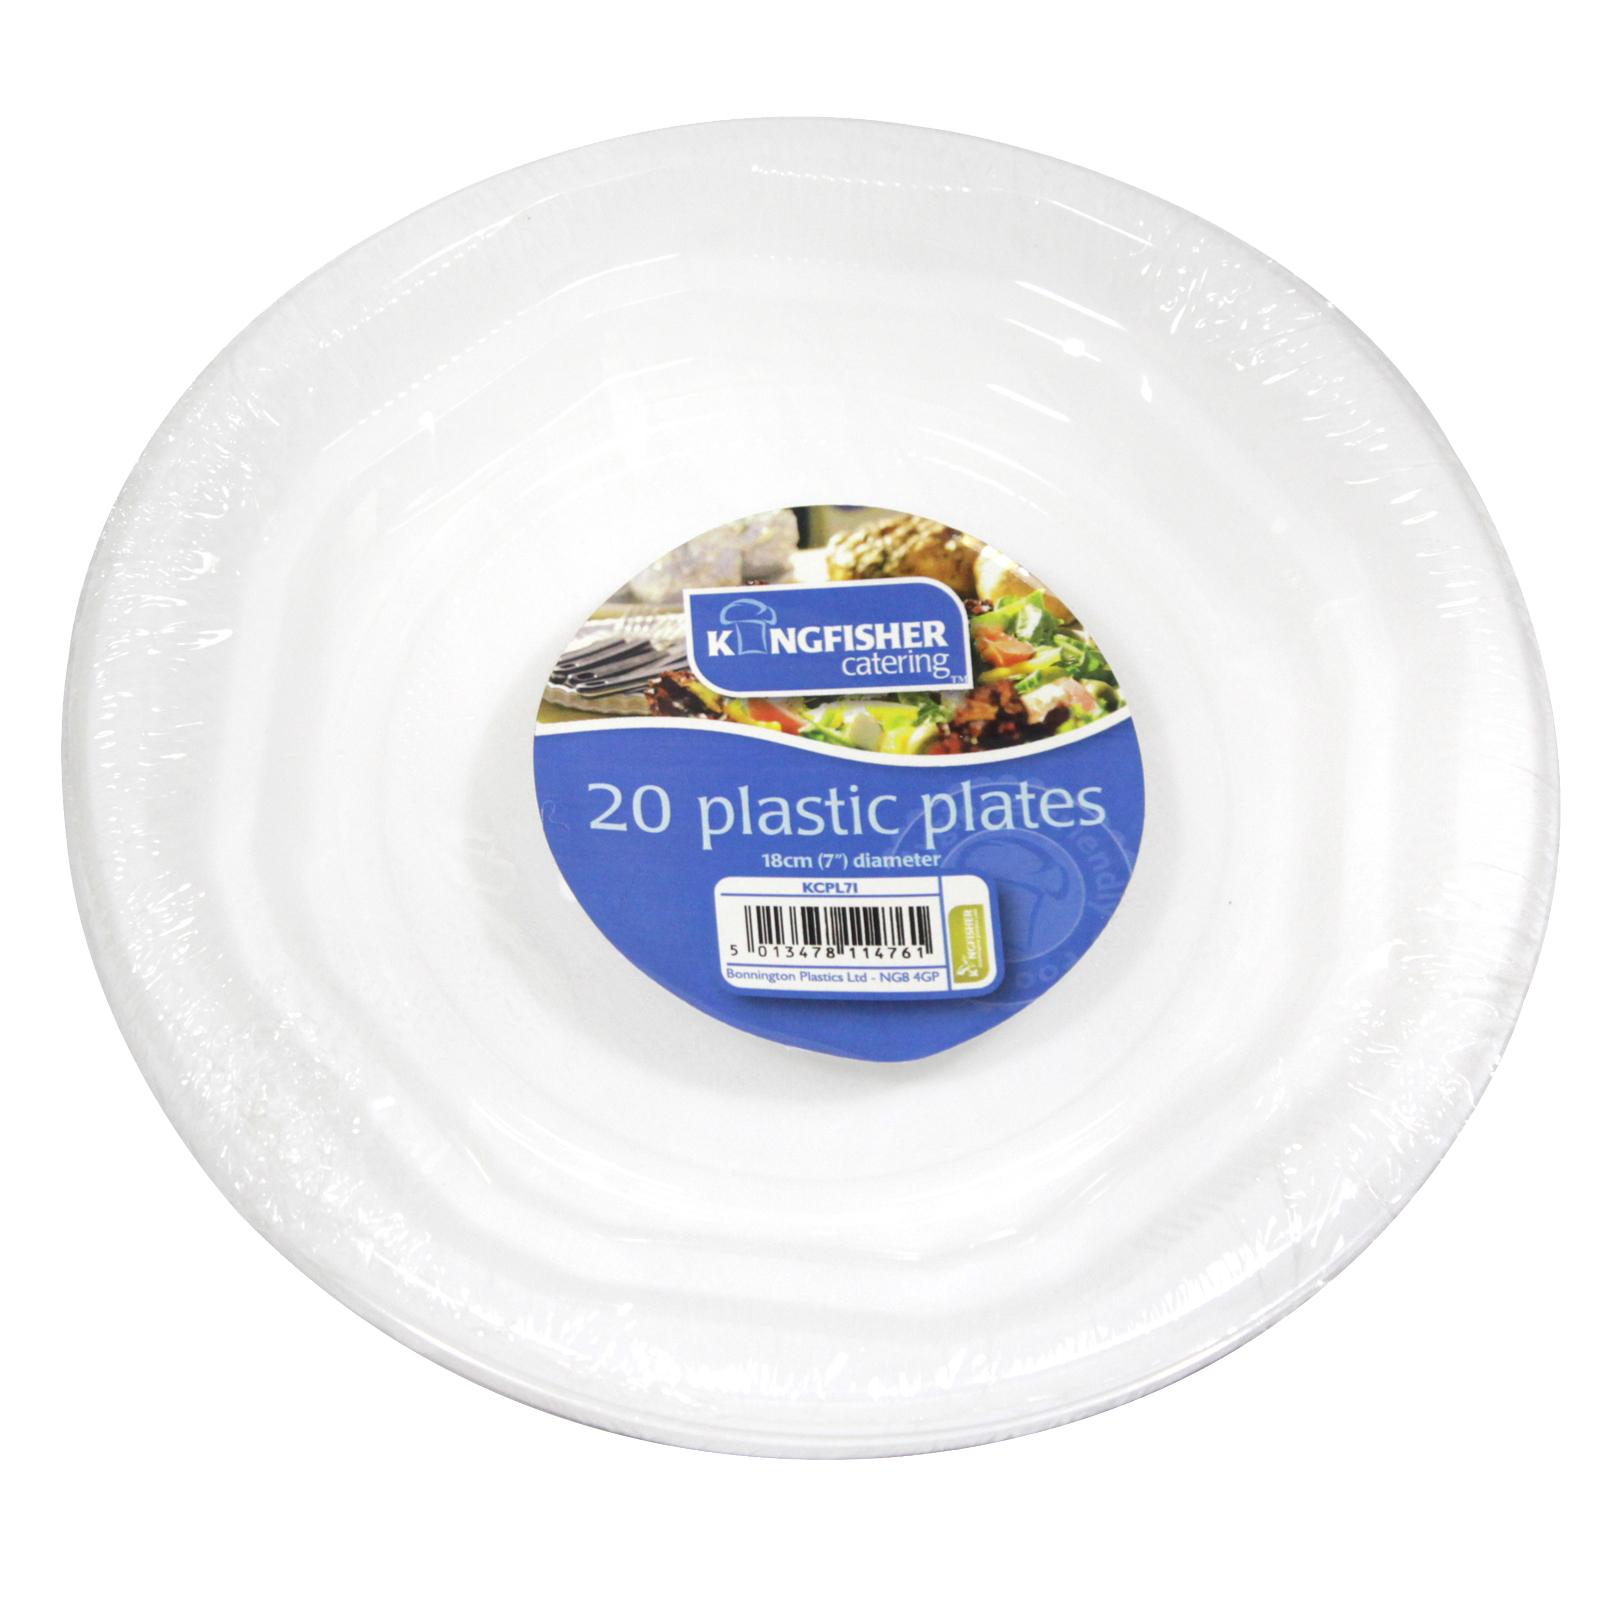 KINGFISHER 20X7 PLASTIC PLATES WHITE